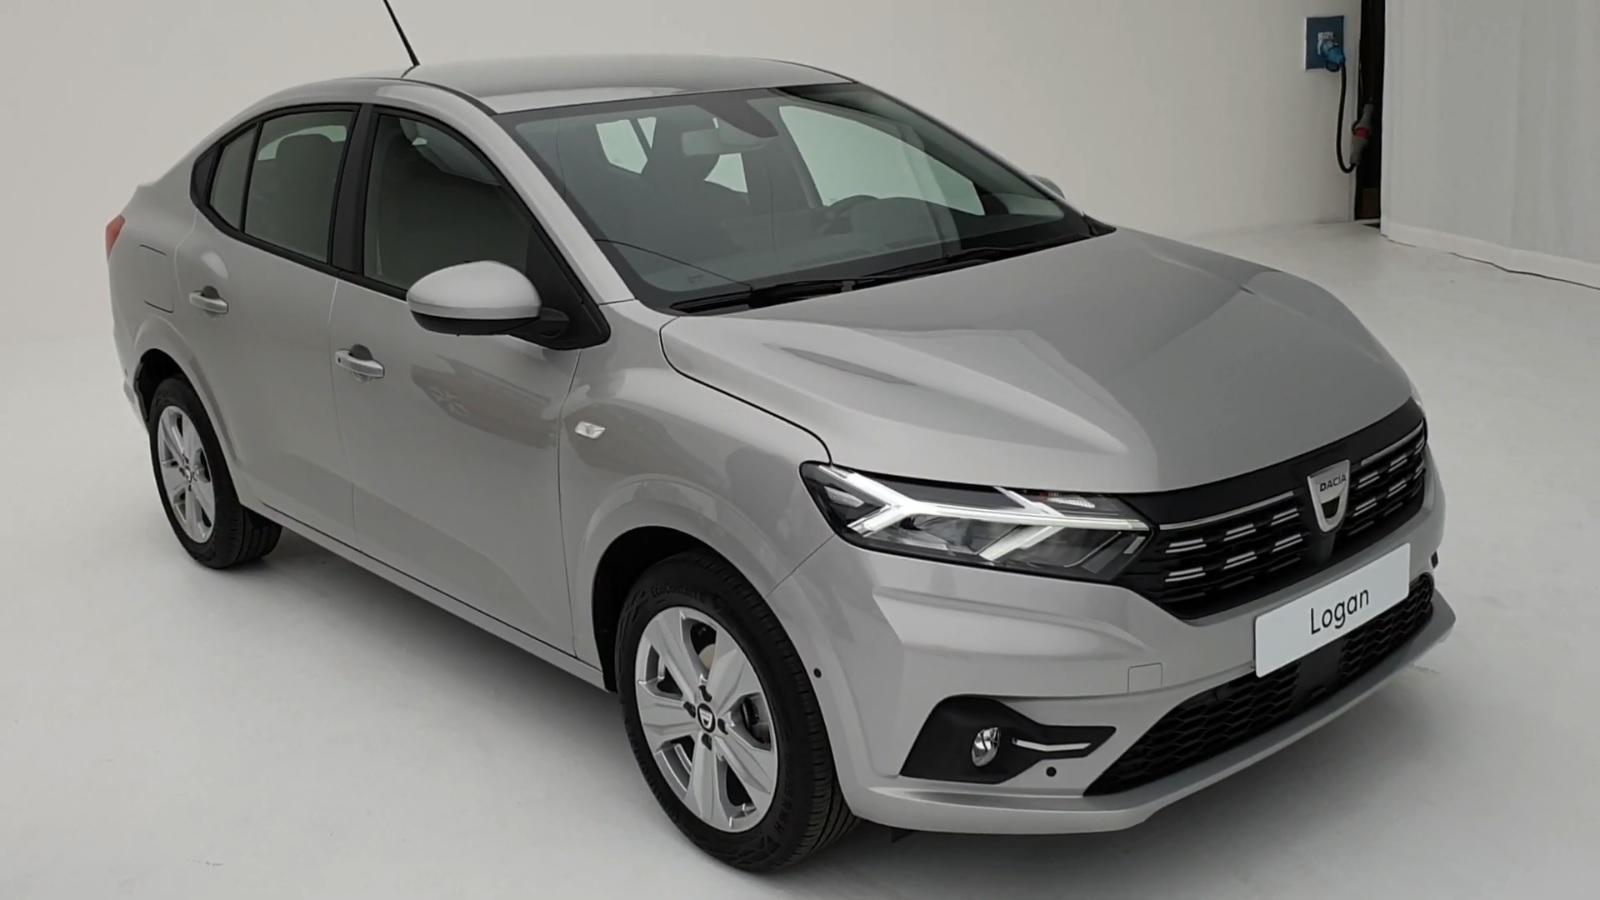 2020 - [Dacia] Sandero / Logan III - Page 26 38